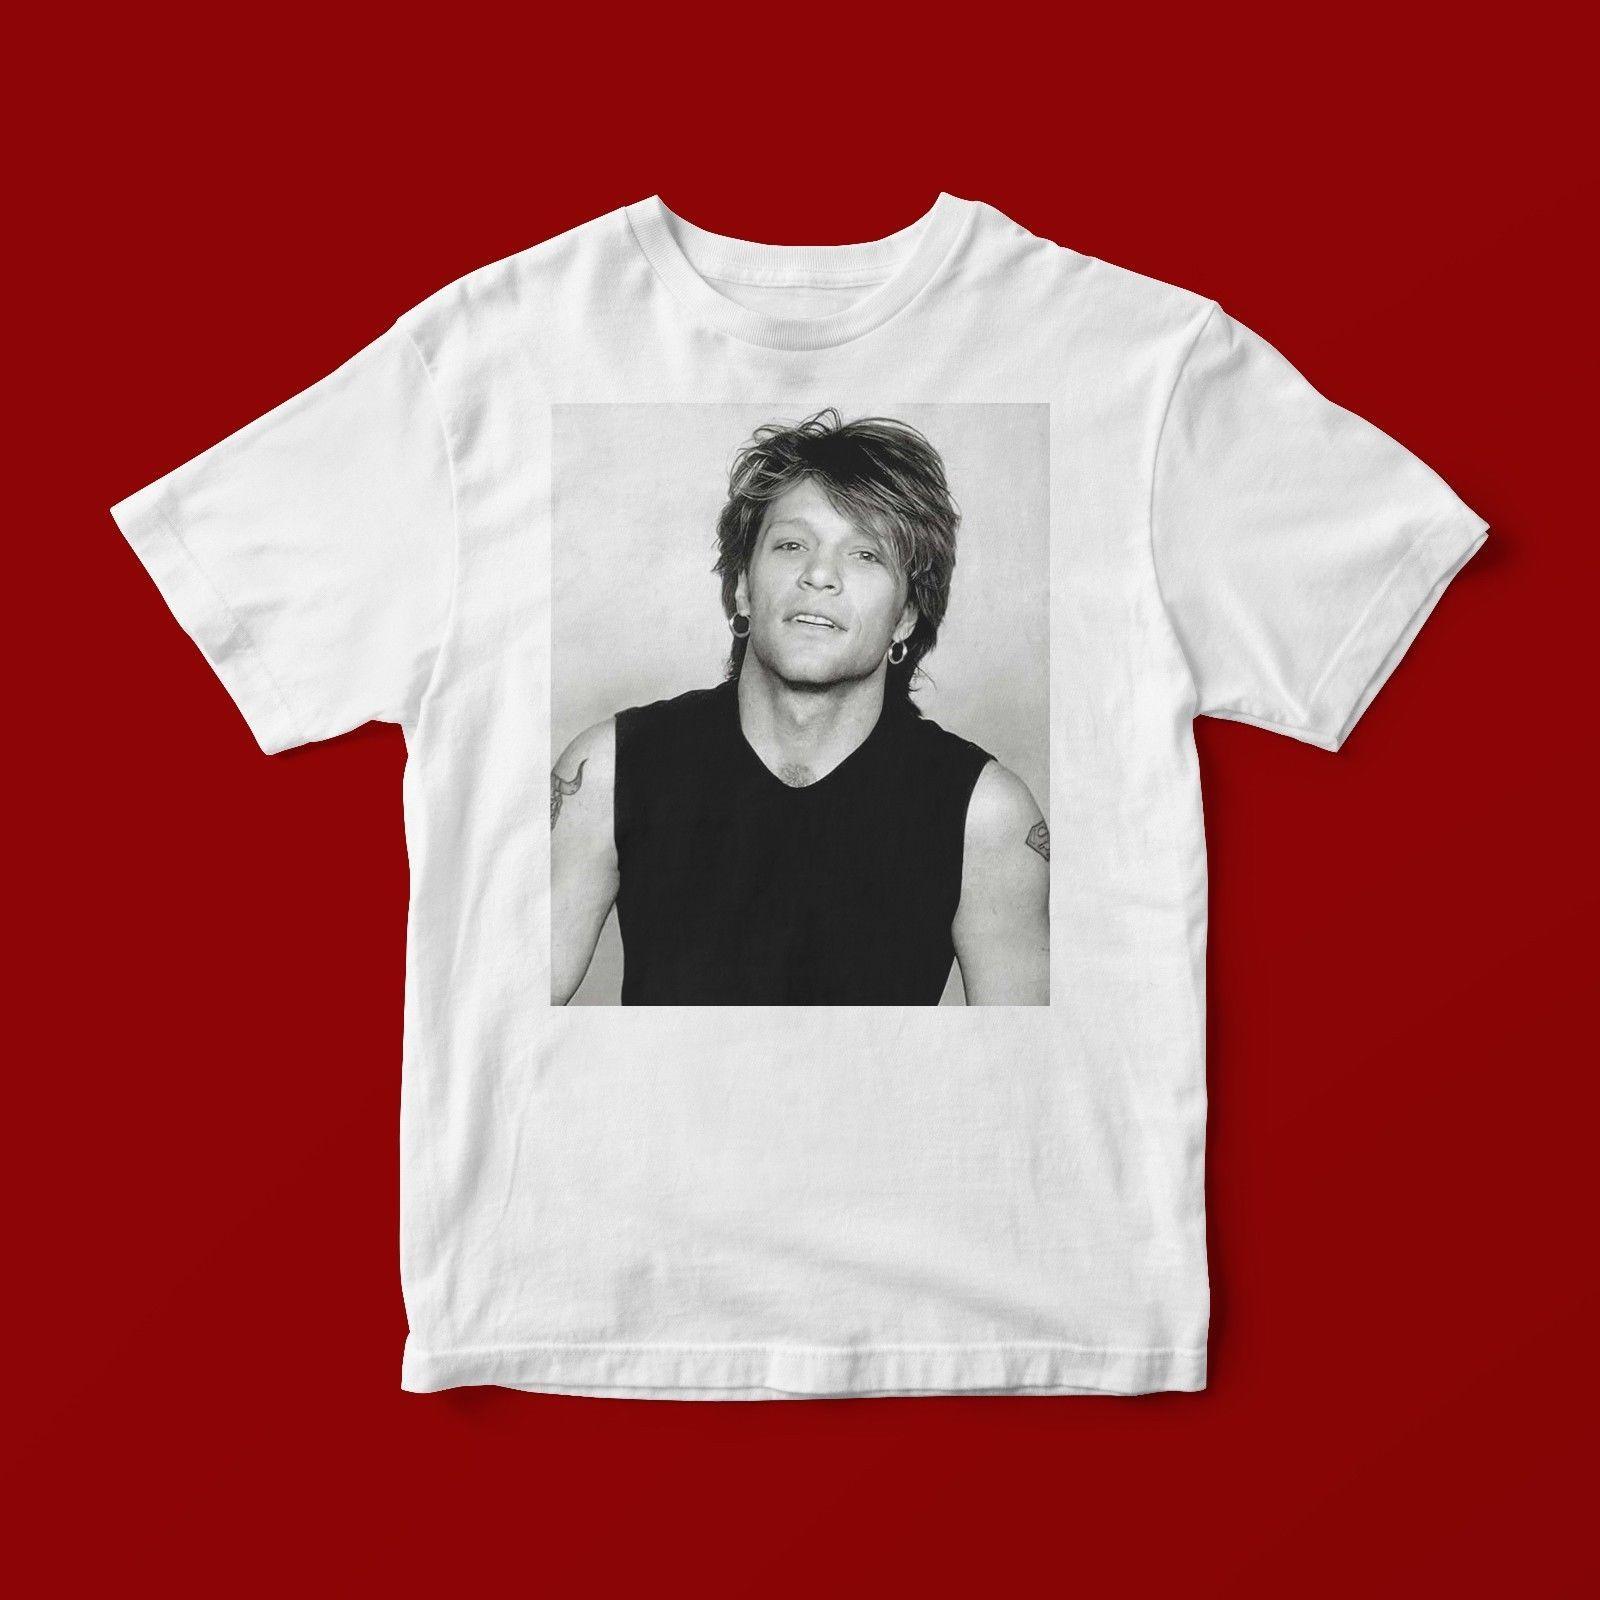 becee3dc BON JOVI T SHIRT UNISEX 256 Short Sleeve Plus Size T Shirt Cool Tee Shirts  Cheap Business Tee Shirts Printing From Asisccup, $16.24| DHgate.Com